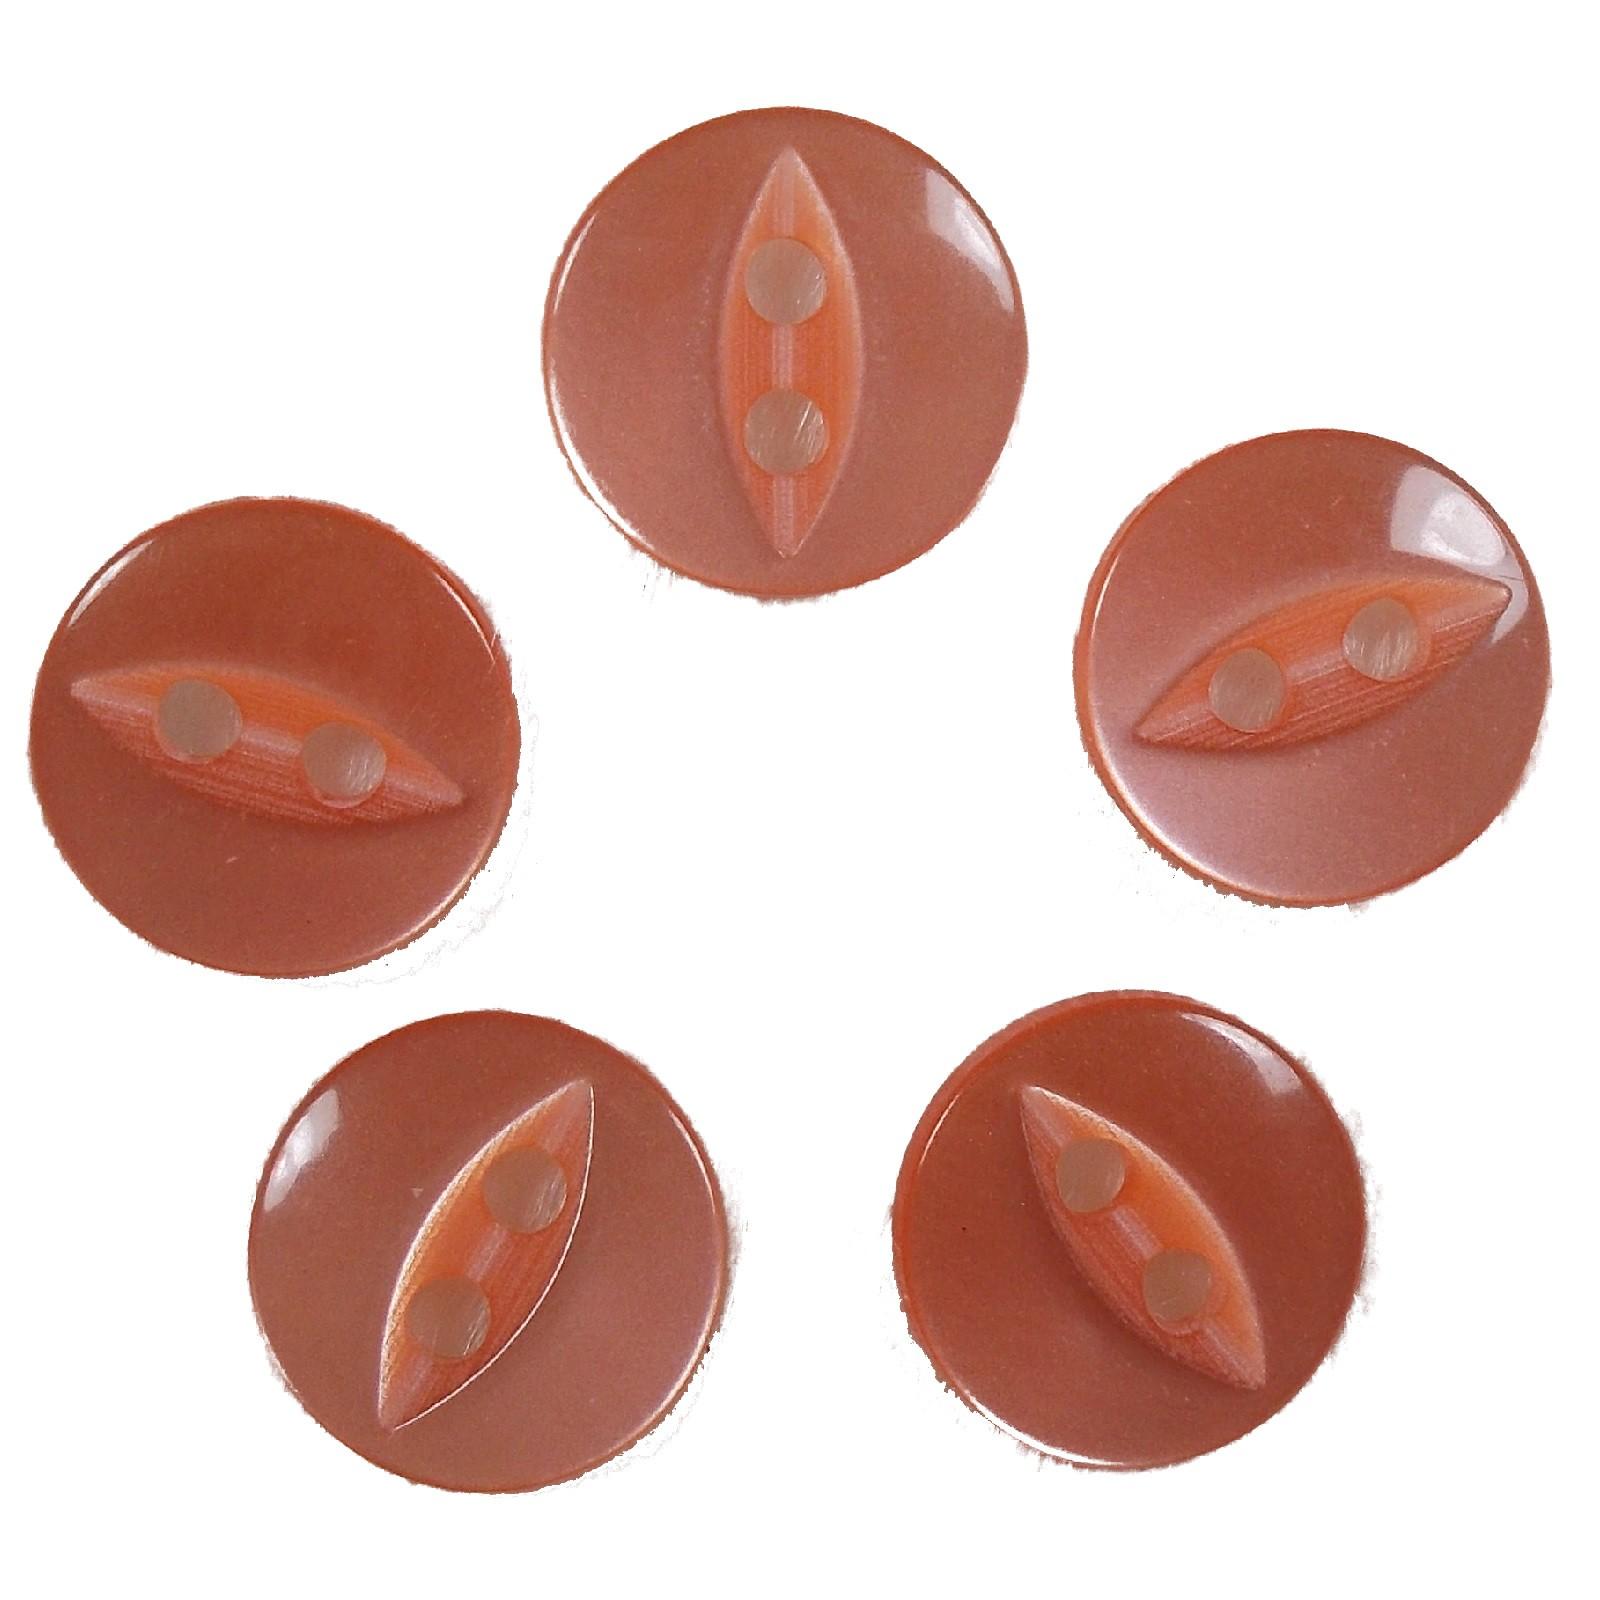 Fisheye Basic Buttons 16mm Orange Pack of 5